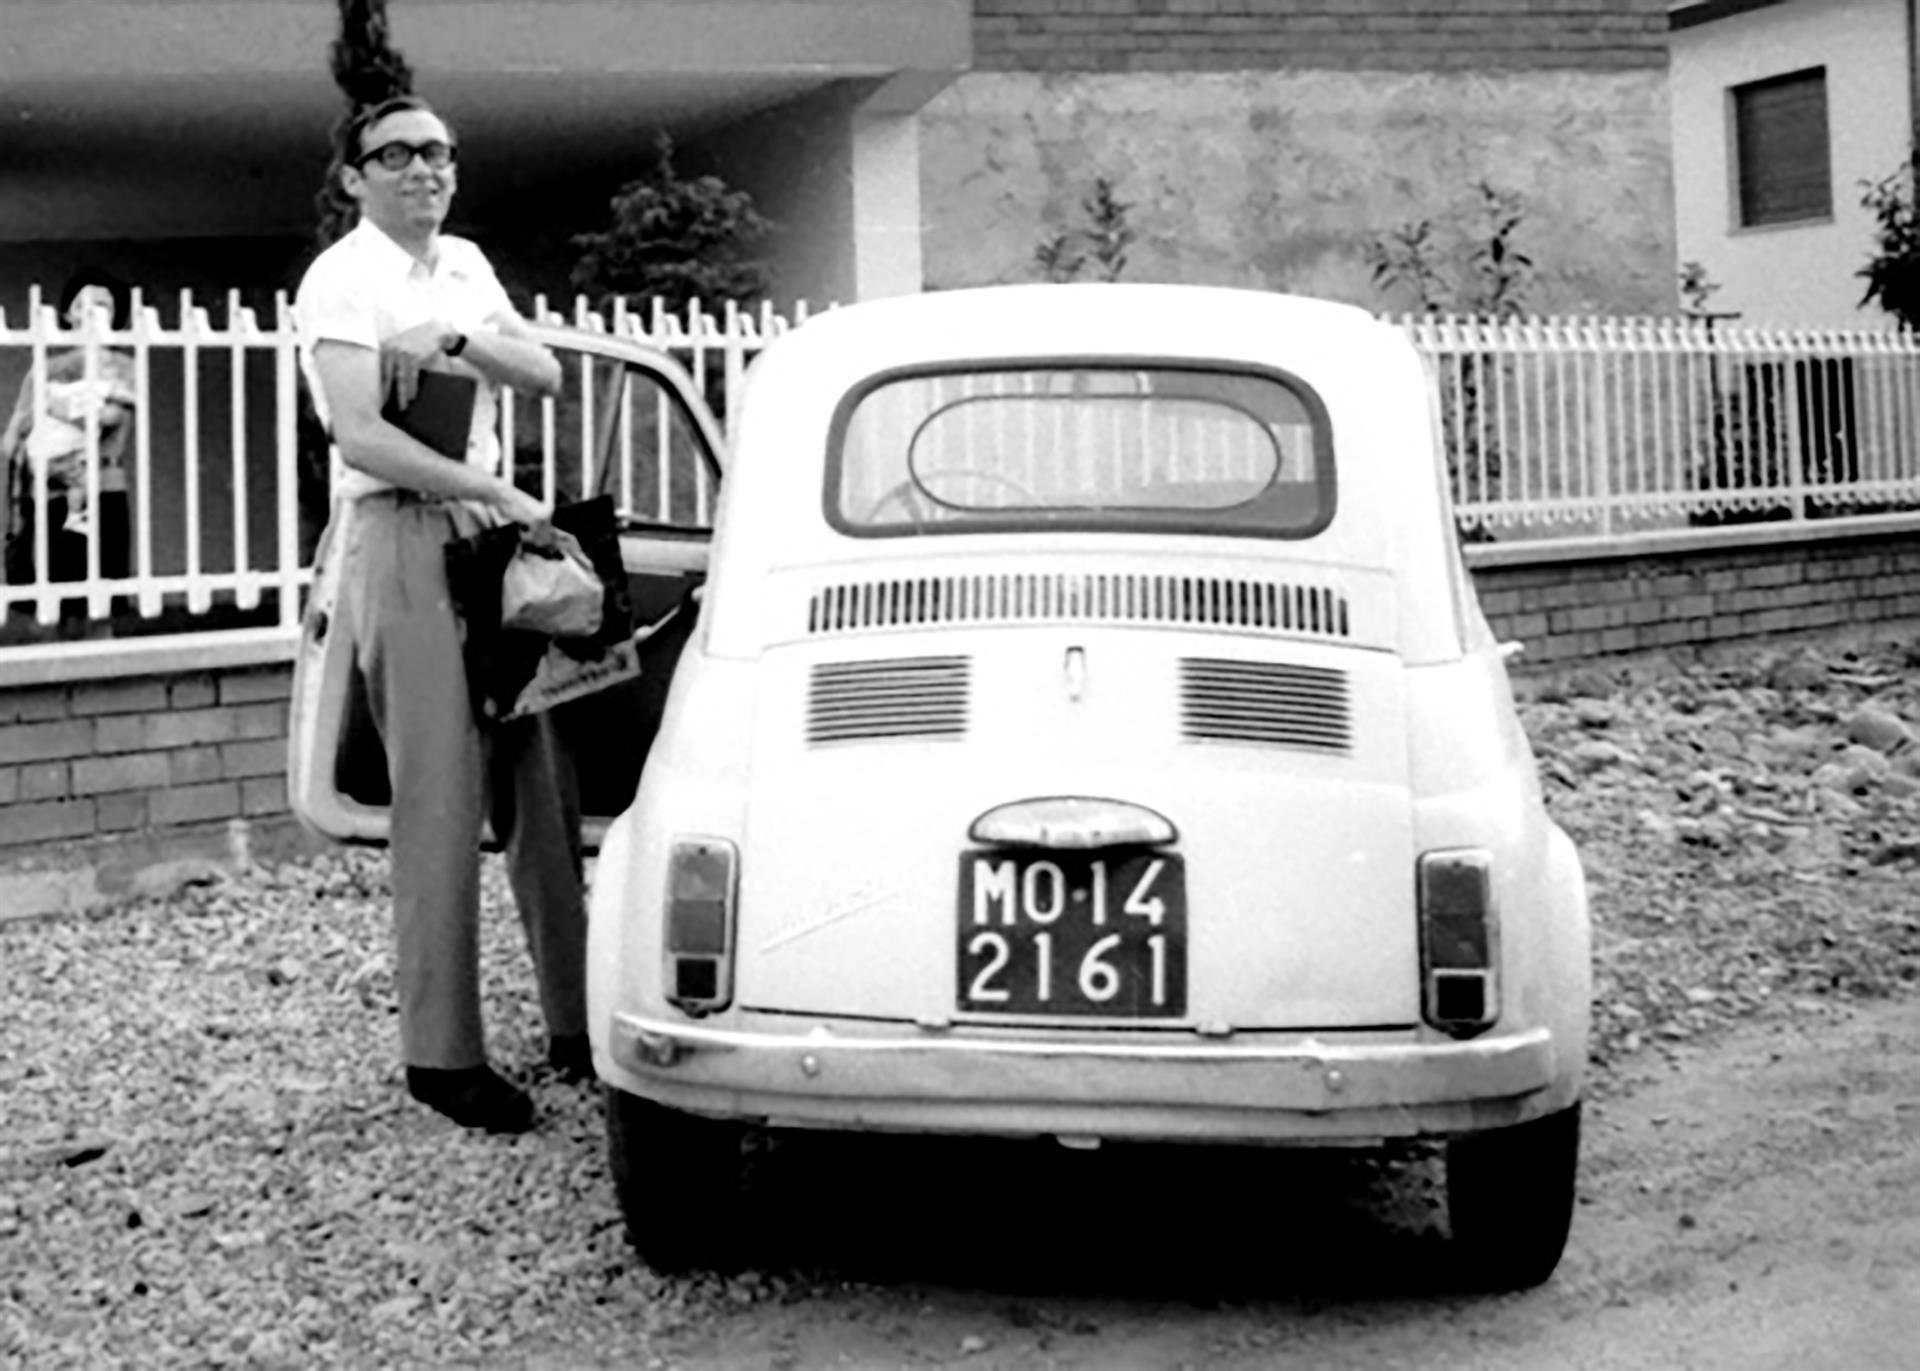 Allo CSAC incontro con Franco Guerzoni  I viaggi randagi con Luigi Ghirri